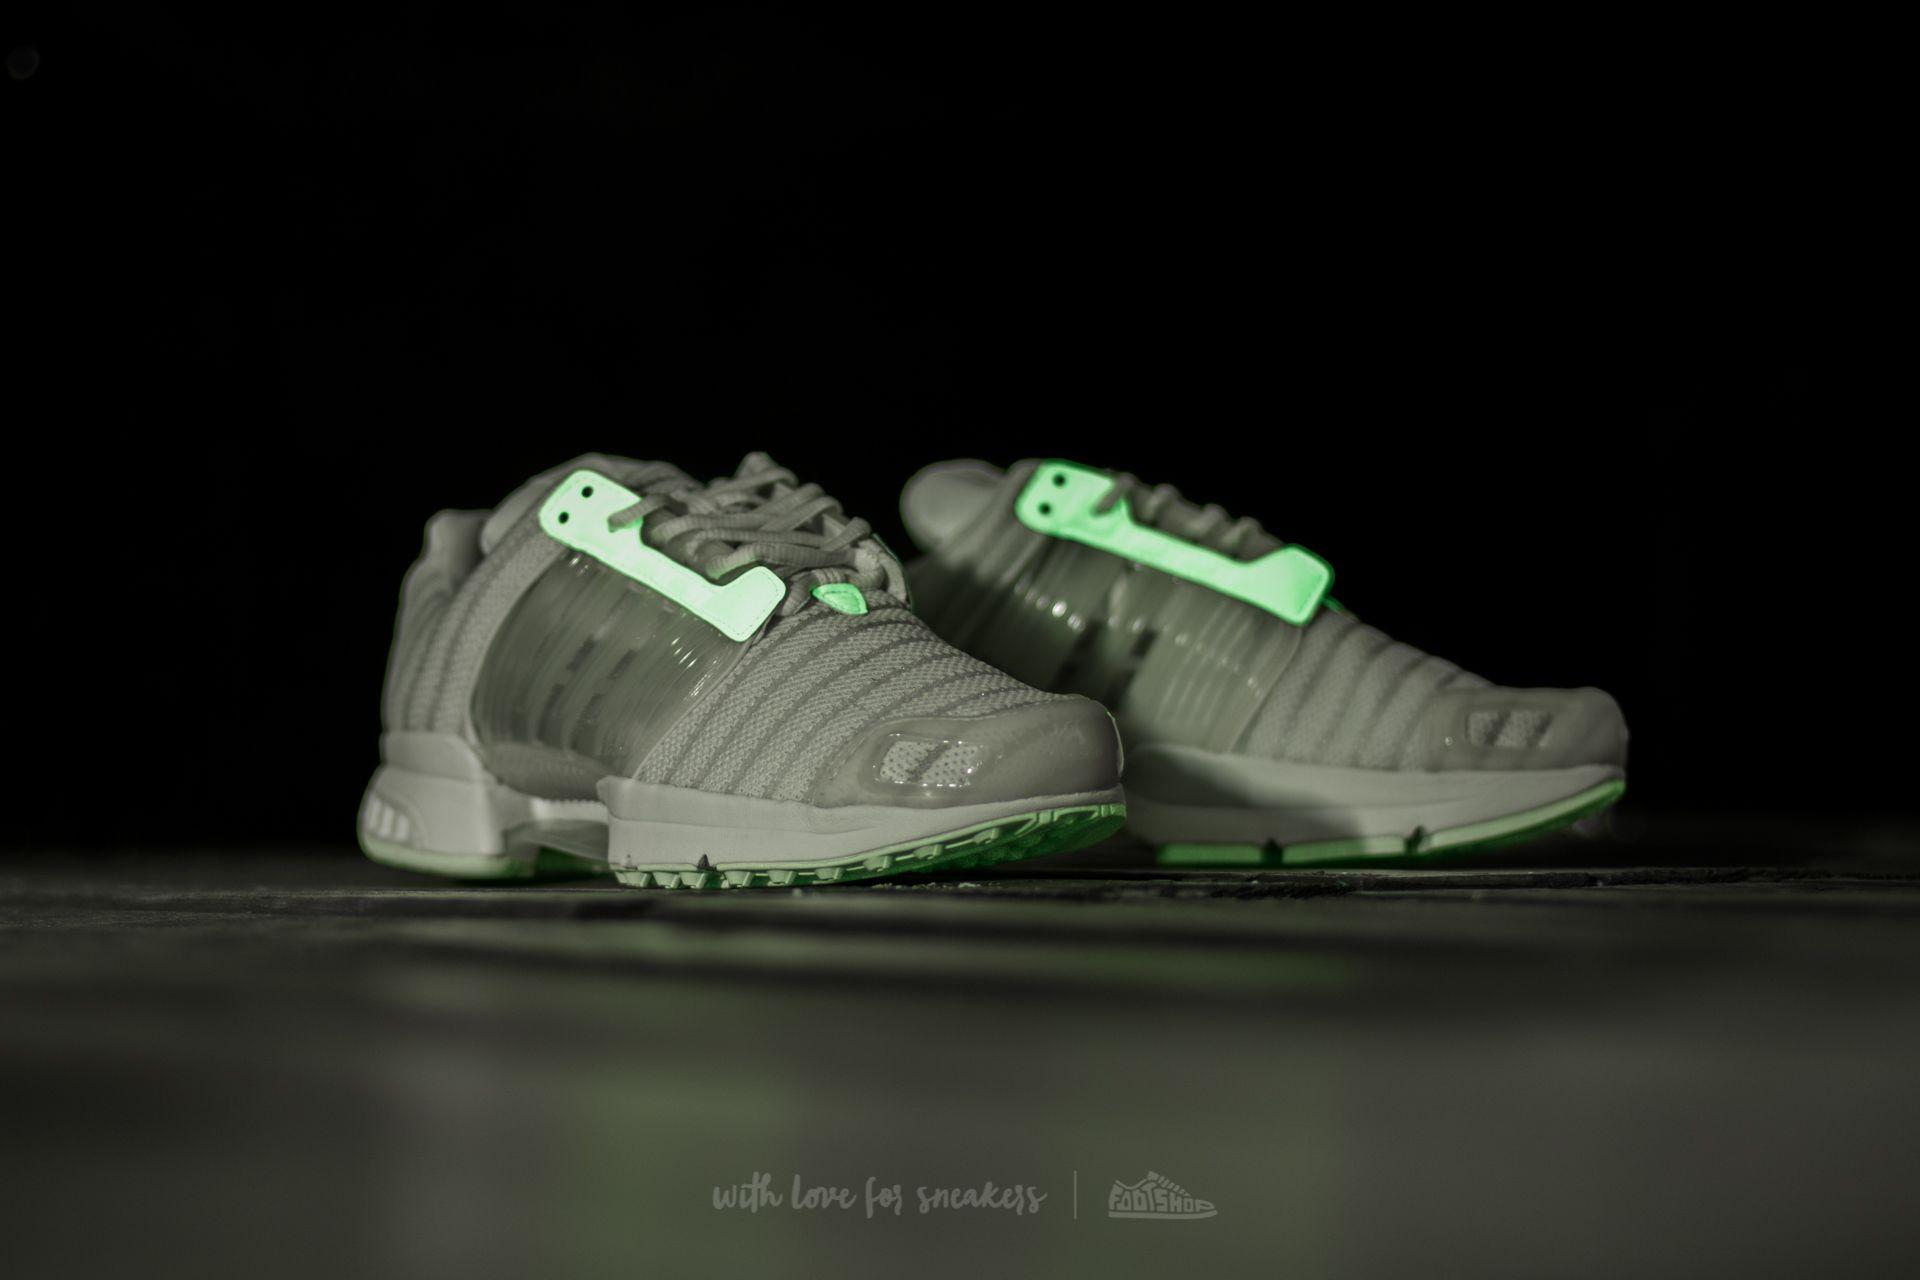 Adidas Wish Consortium Climacool eFtw X Sneakerboy White 1 S K1lFT3Jc